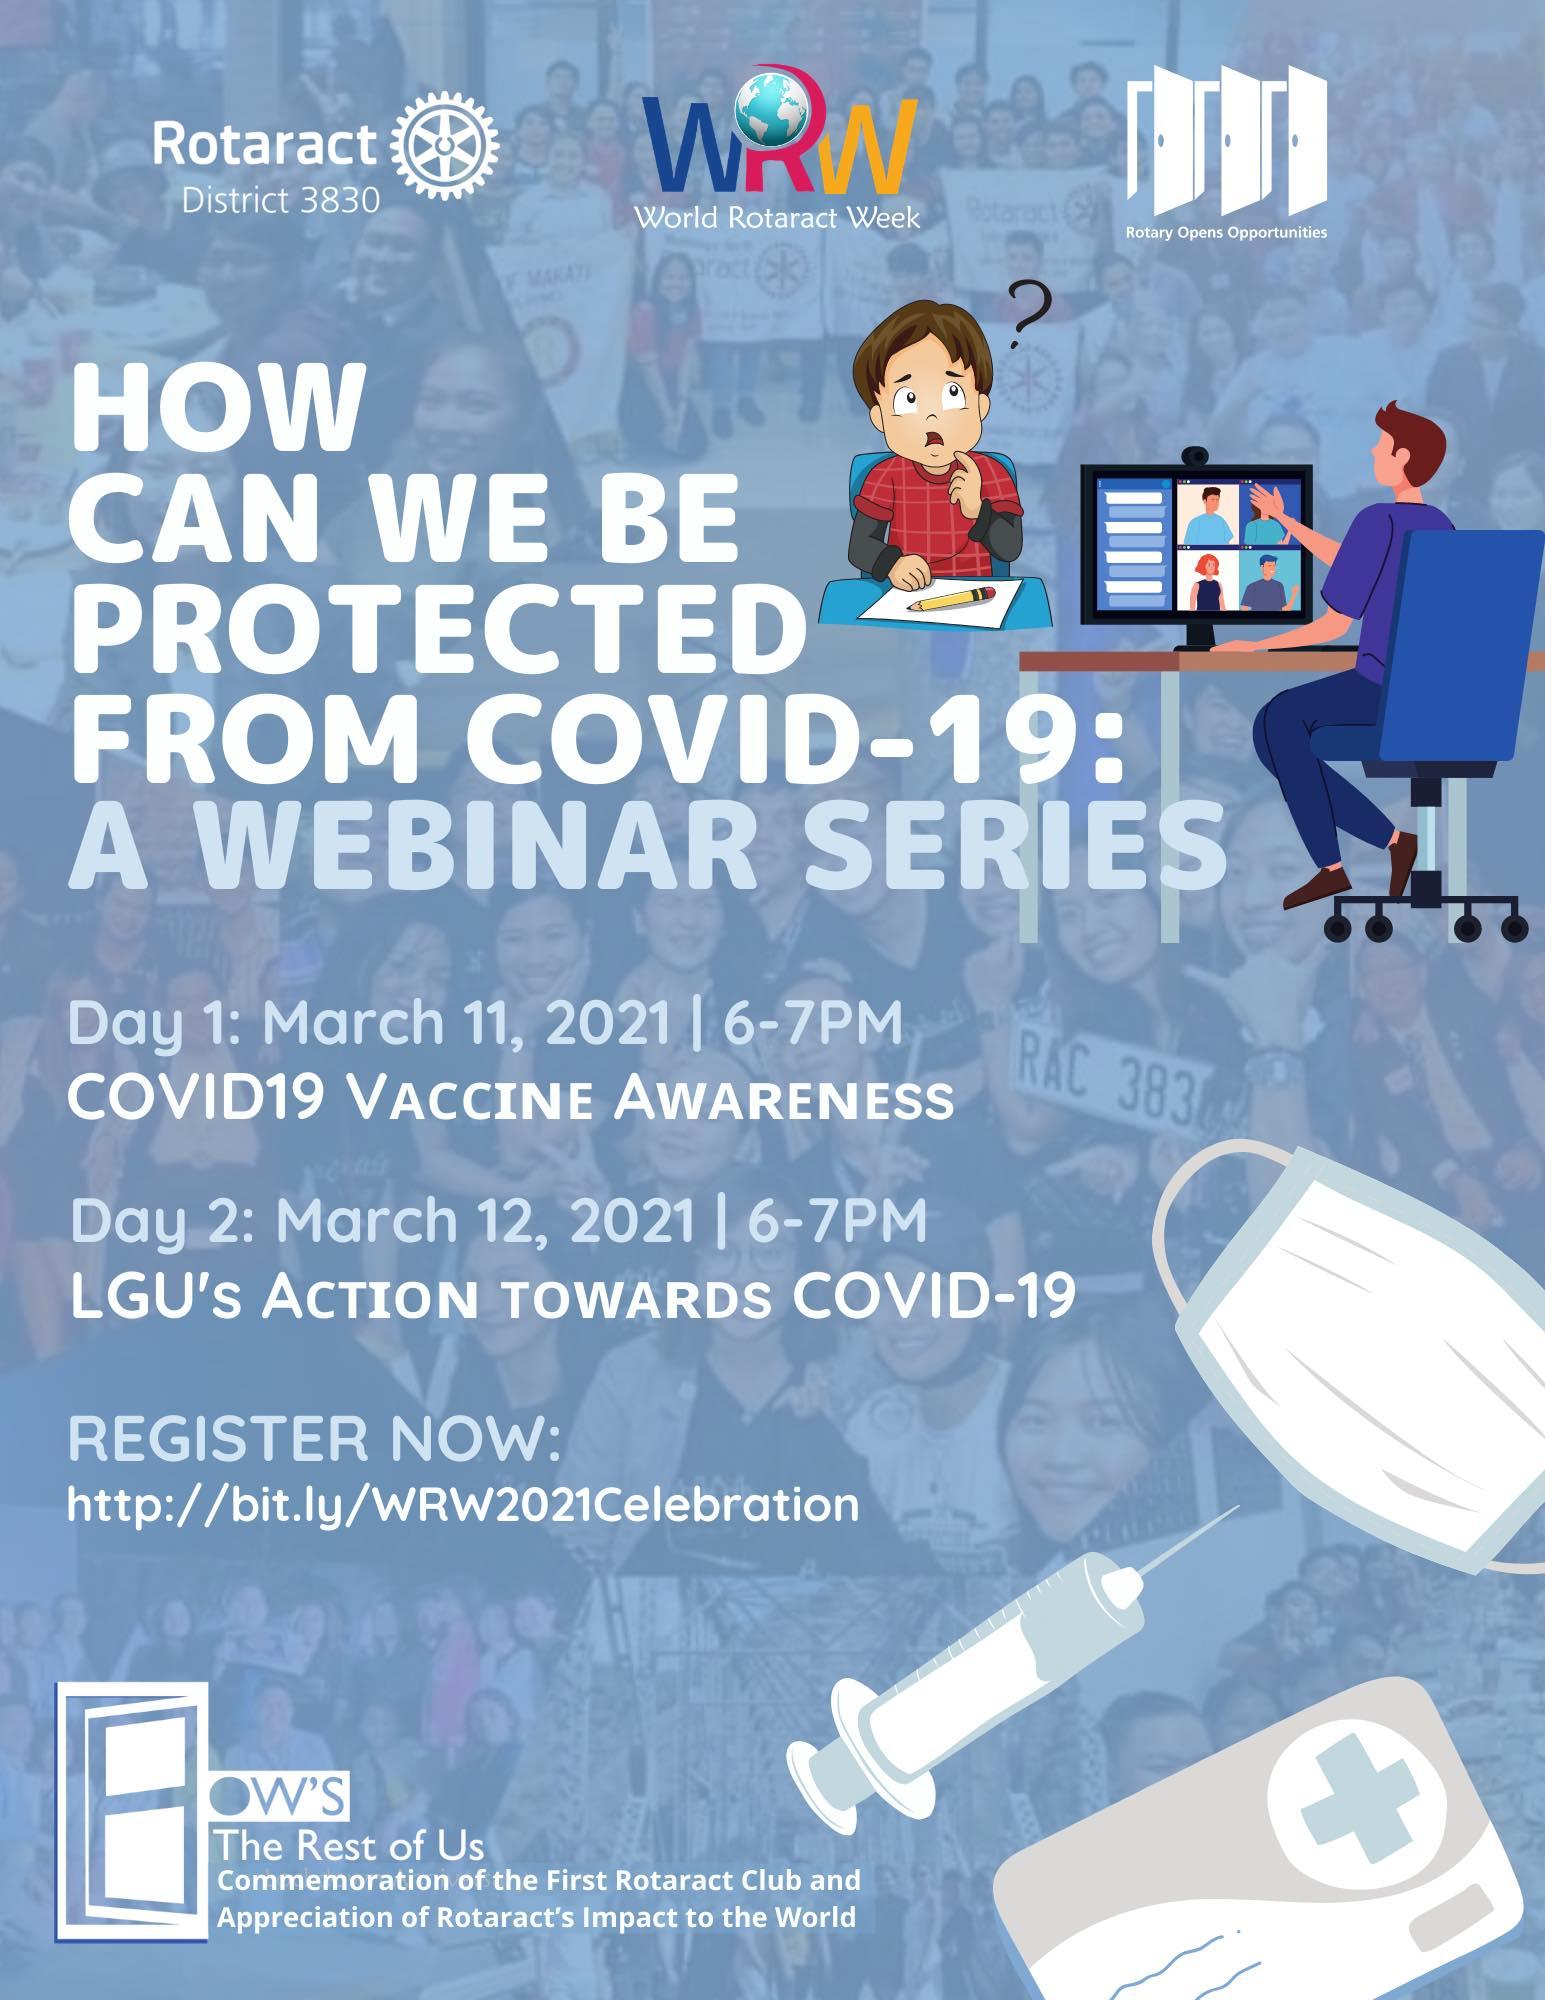 COVID-19 Response and Vaccine Awareness Webinars